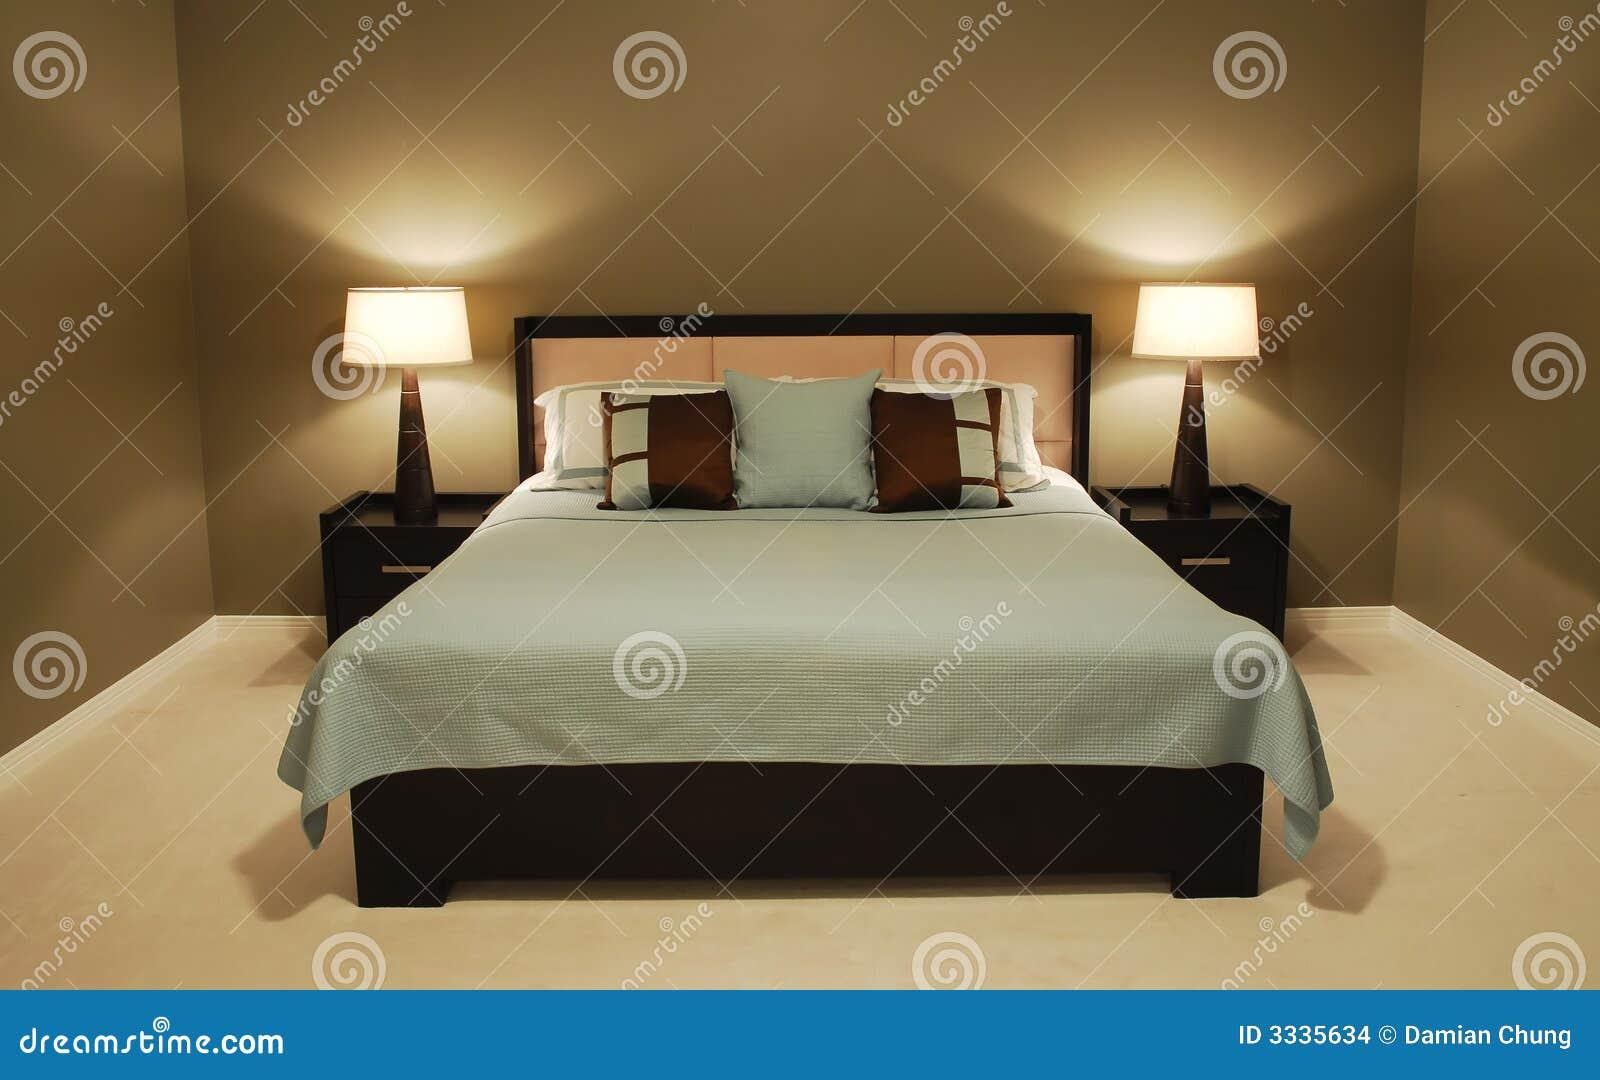 Fancy Bedroom Stock Images - Image: 3335634